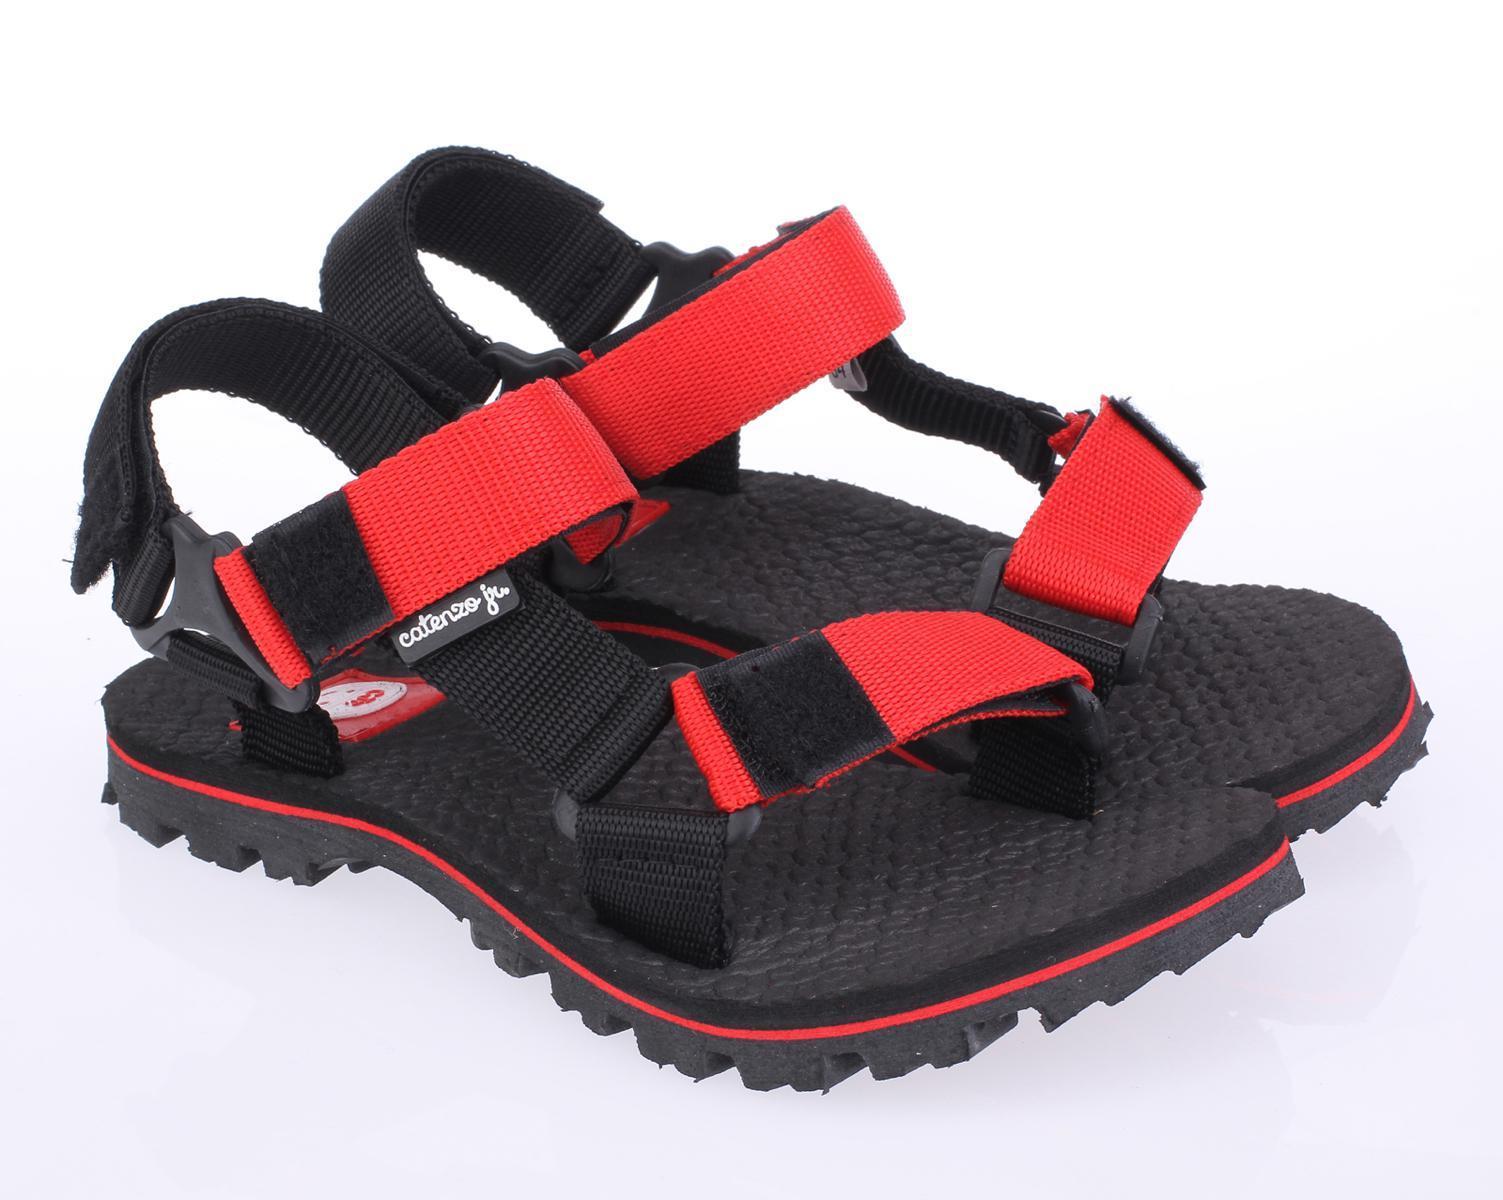 Sandal Gunung Anak Sepatu Sendal Catenzo Jr CJJ002